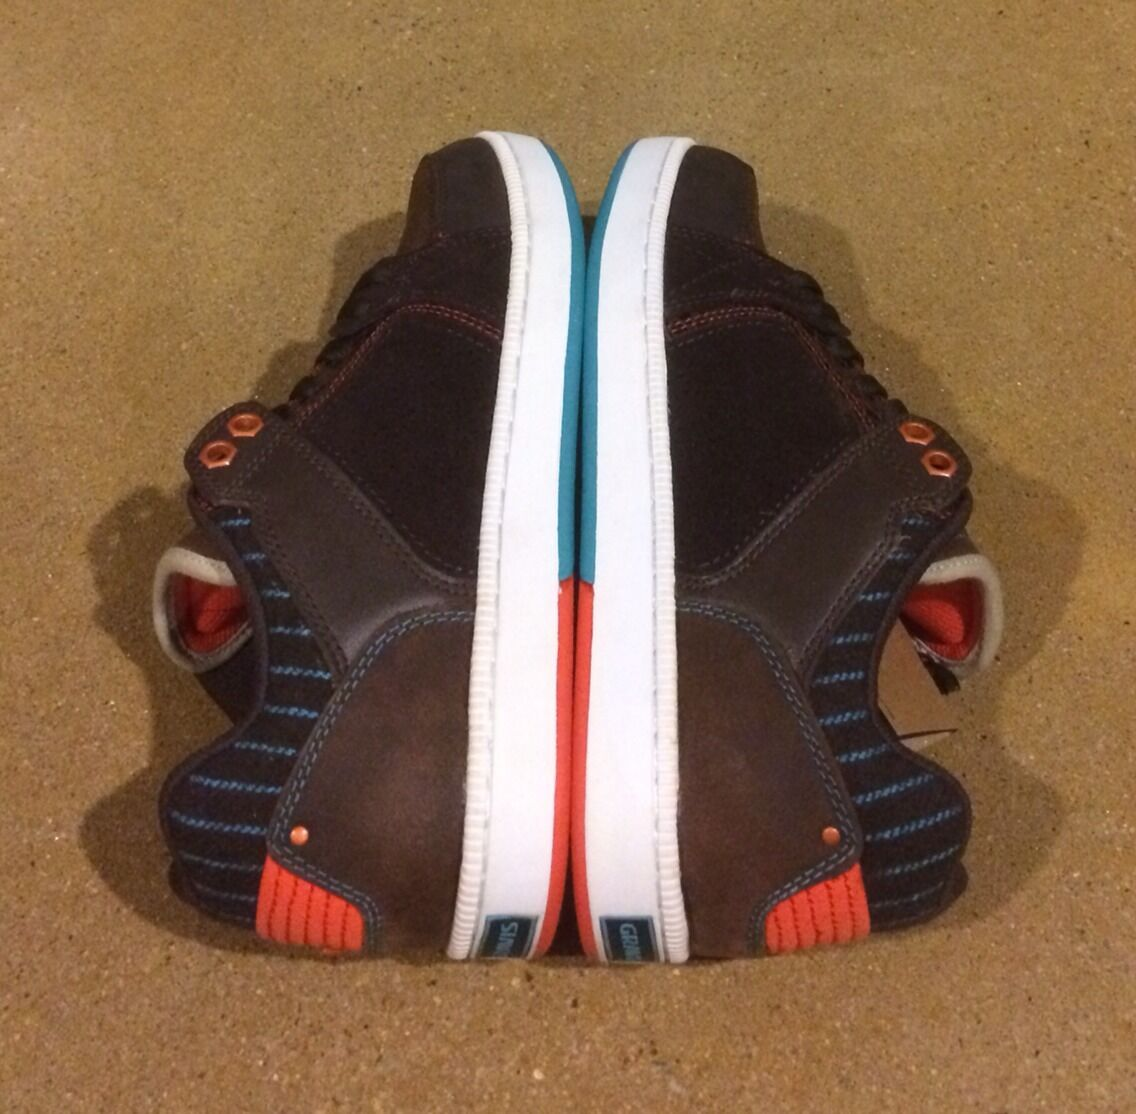 Gravis Viking Arto Saari Size 7 Dark Coffee Baltic Burton BMX DC Skate Shoes